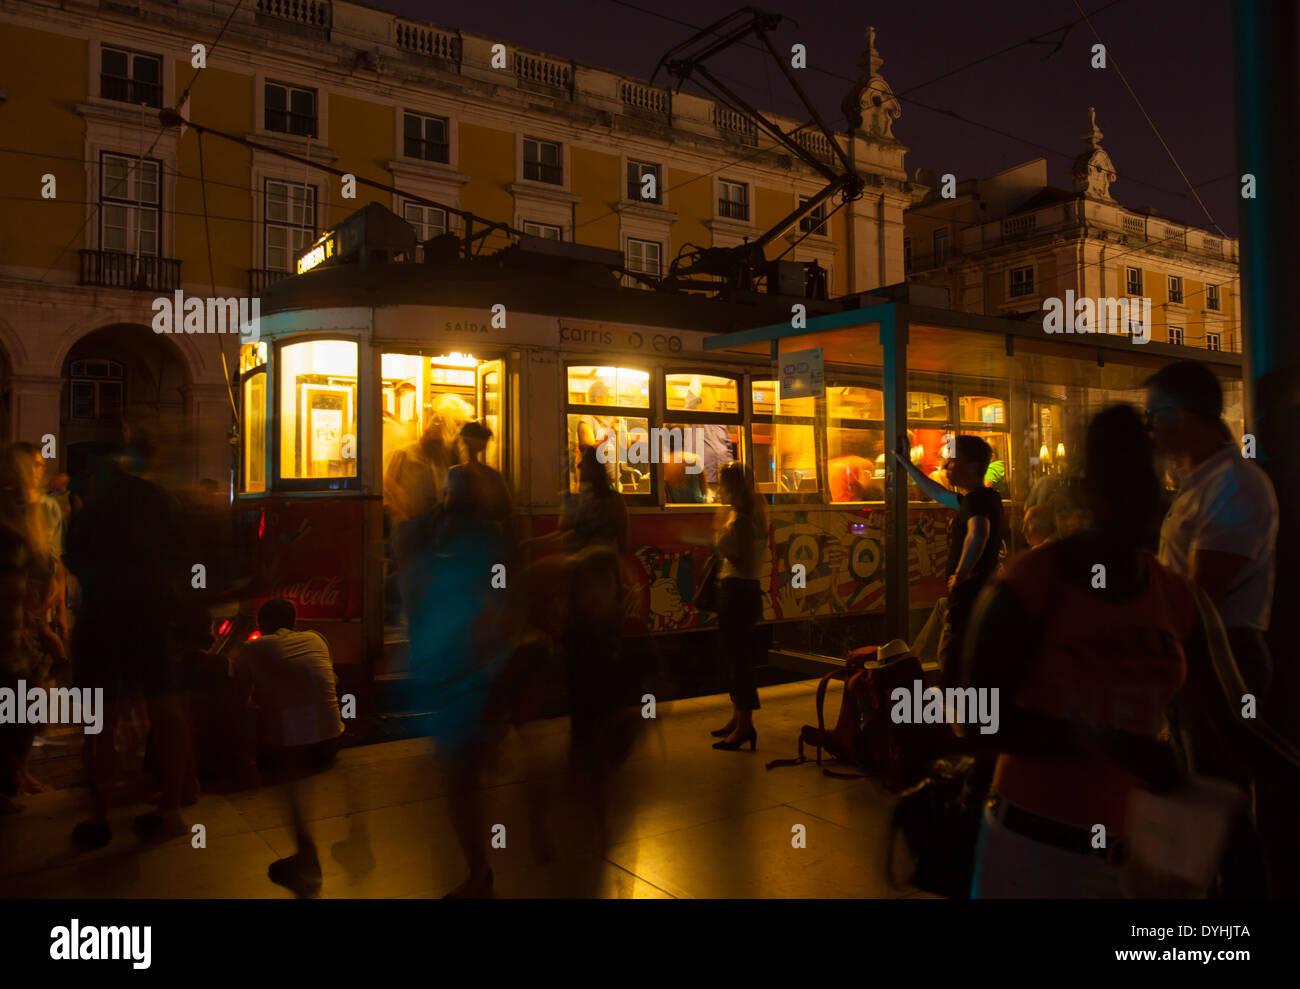 Tram 28 at night, Praca do Comercio, Lisbon, Portugal. - Stock Image